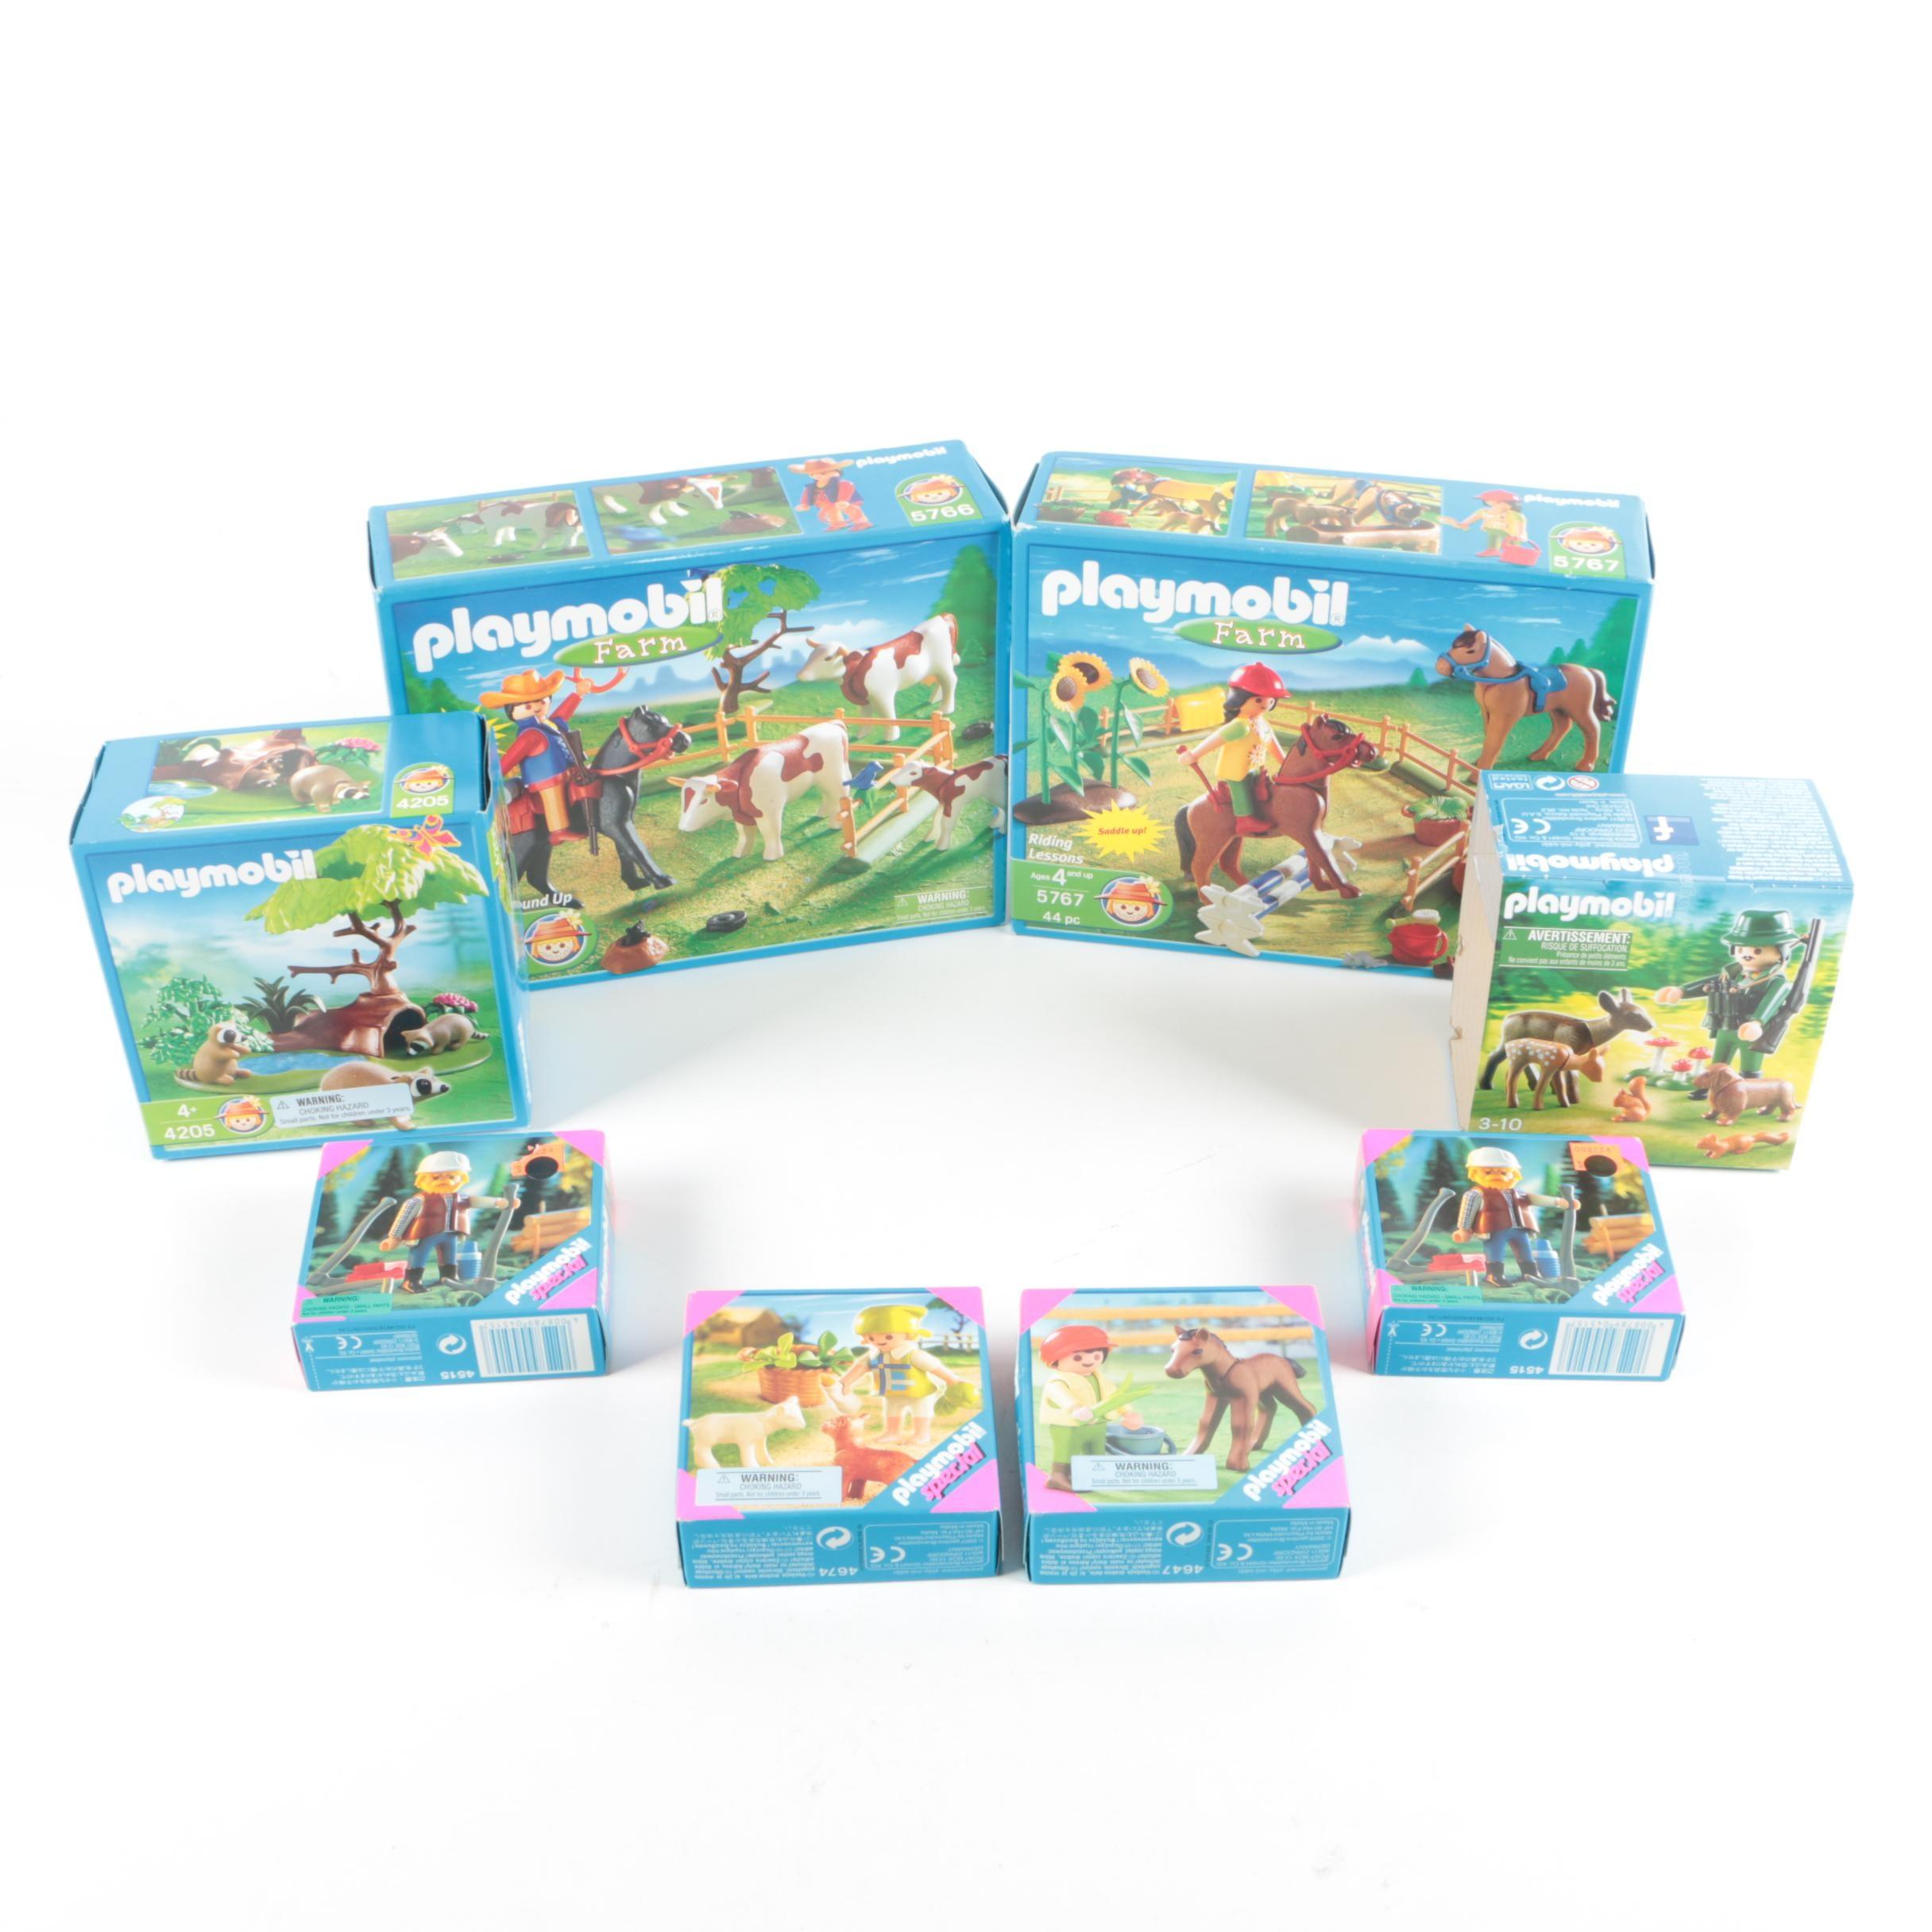 Playmobil Farm and Wildlife Themed Play Sets